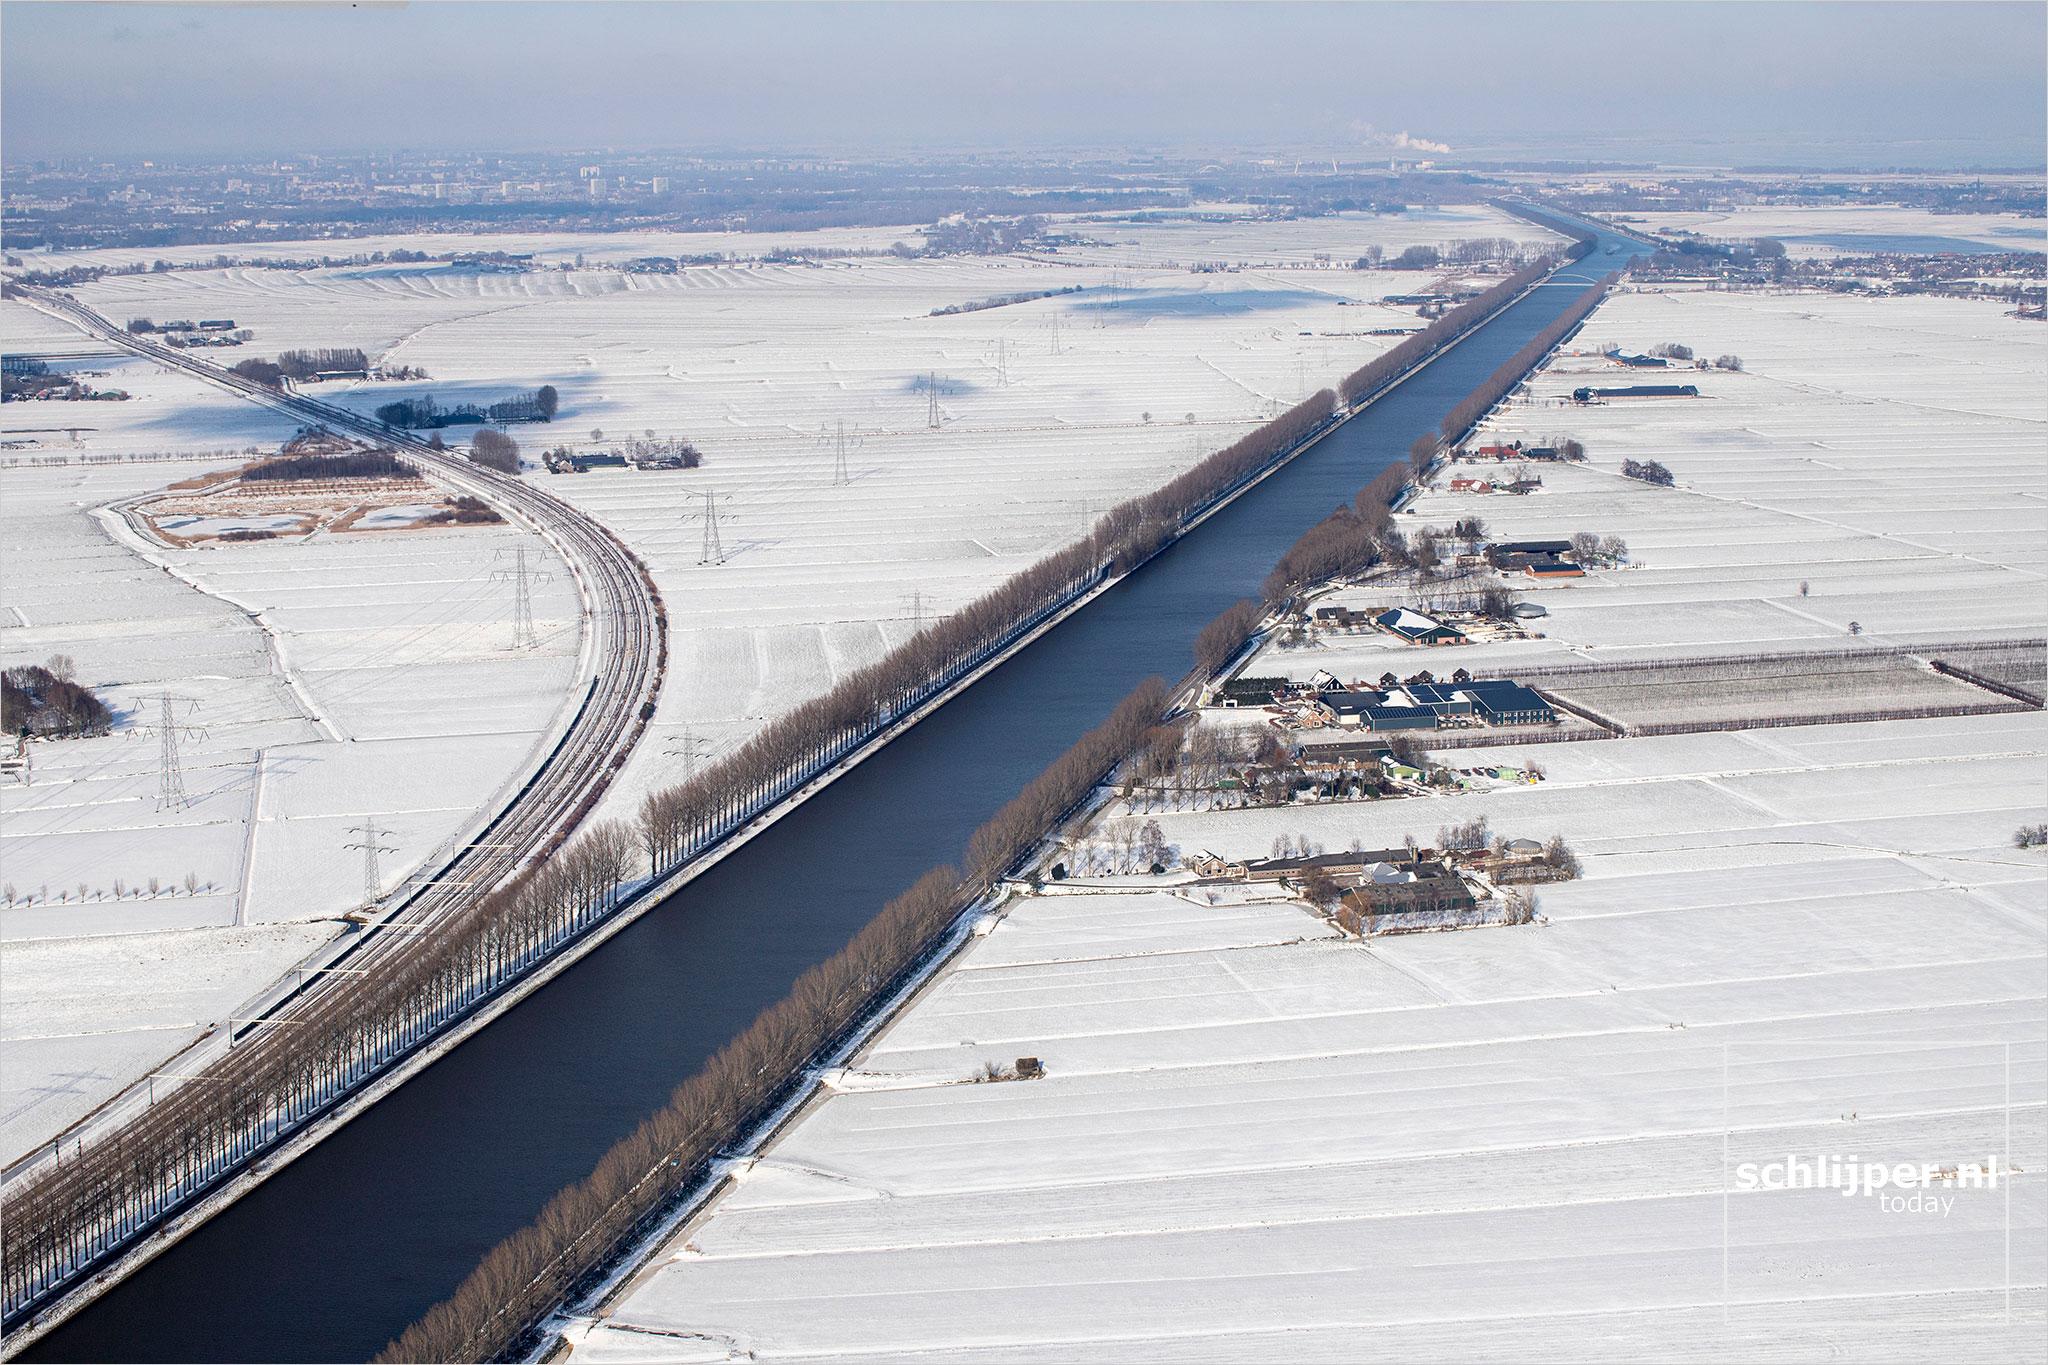 The Netherlands, Baambrugge, Vreeland, 12 februari 2021